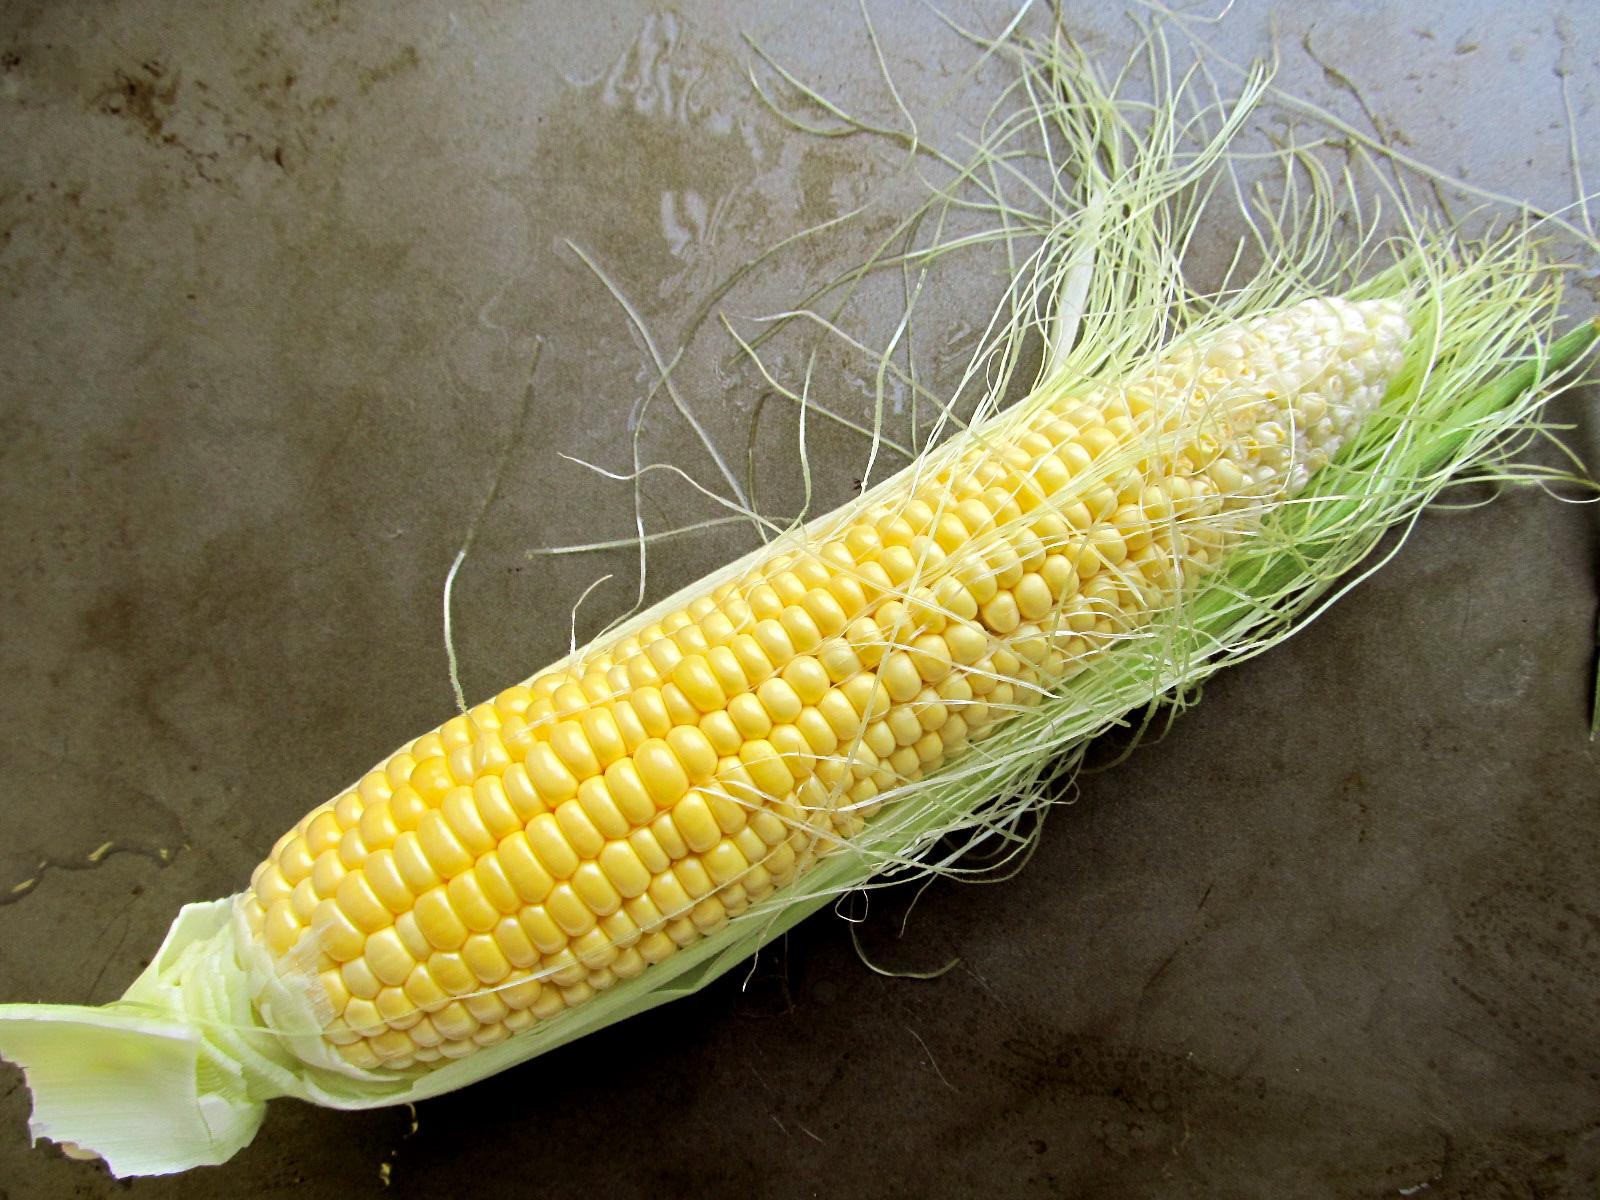 Sweet Corn Wallpaper Here in New York